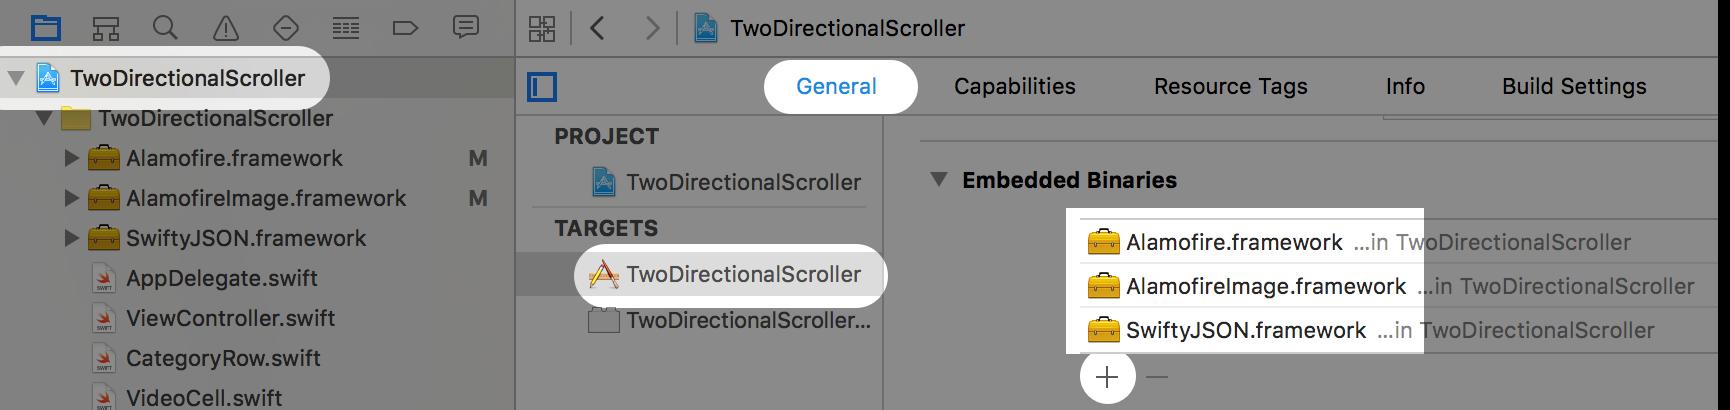 adding embedded binaries